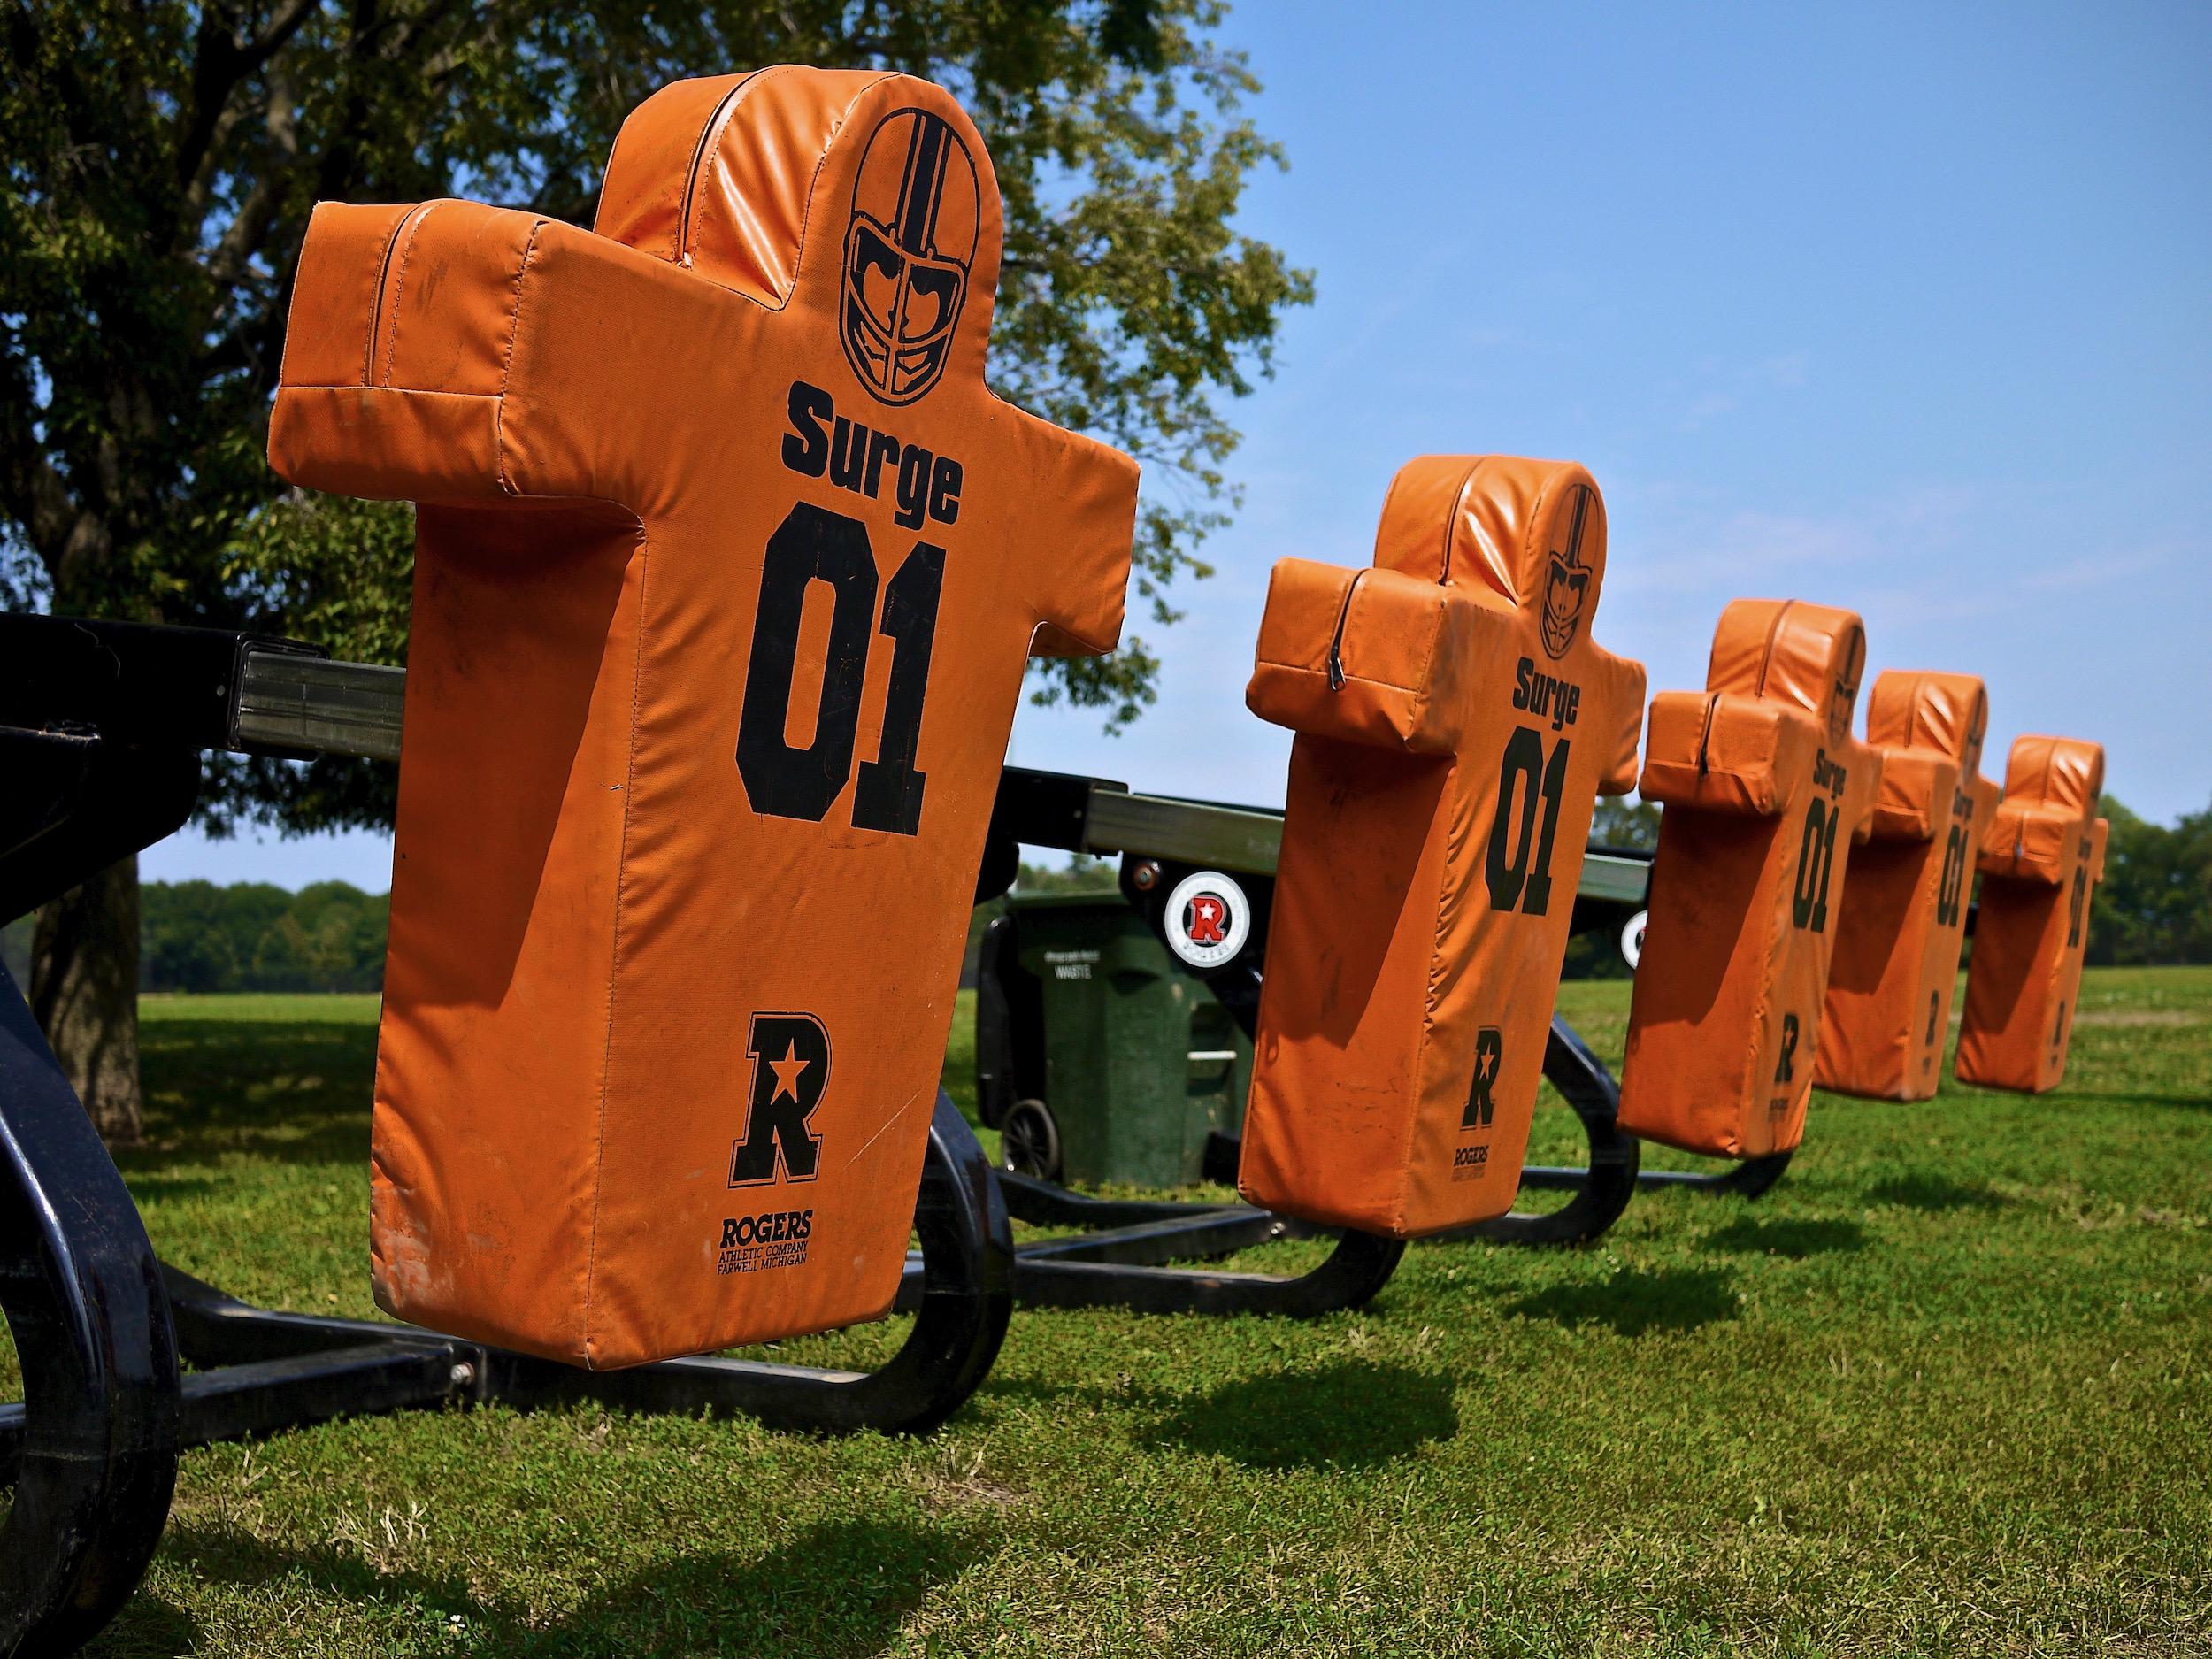 A row of football training dummies.